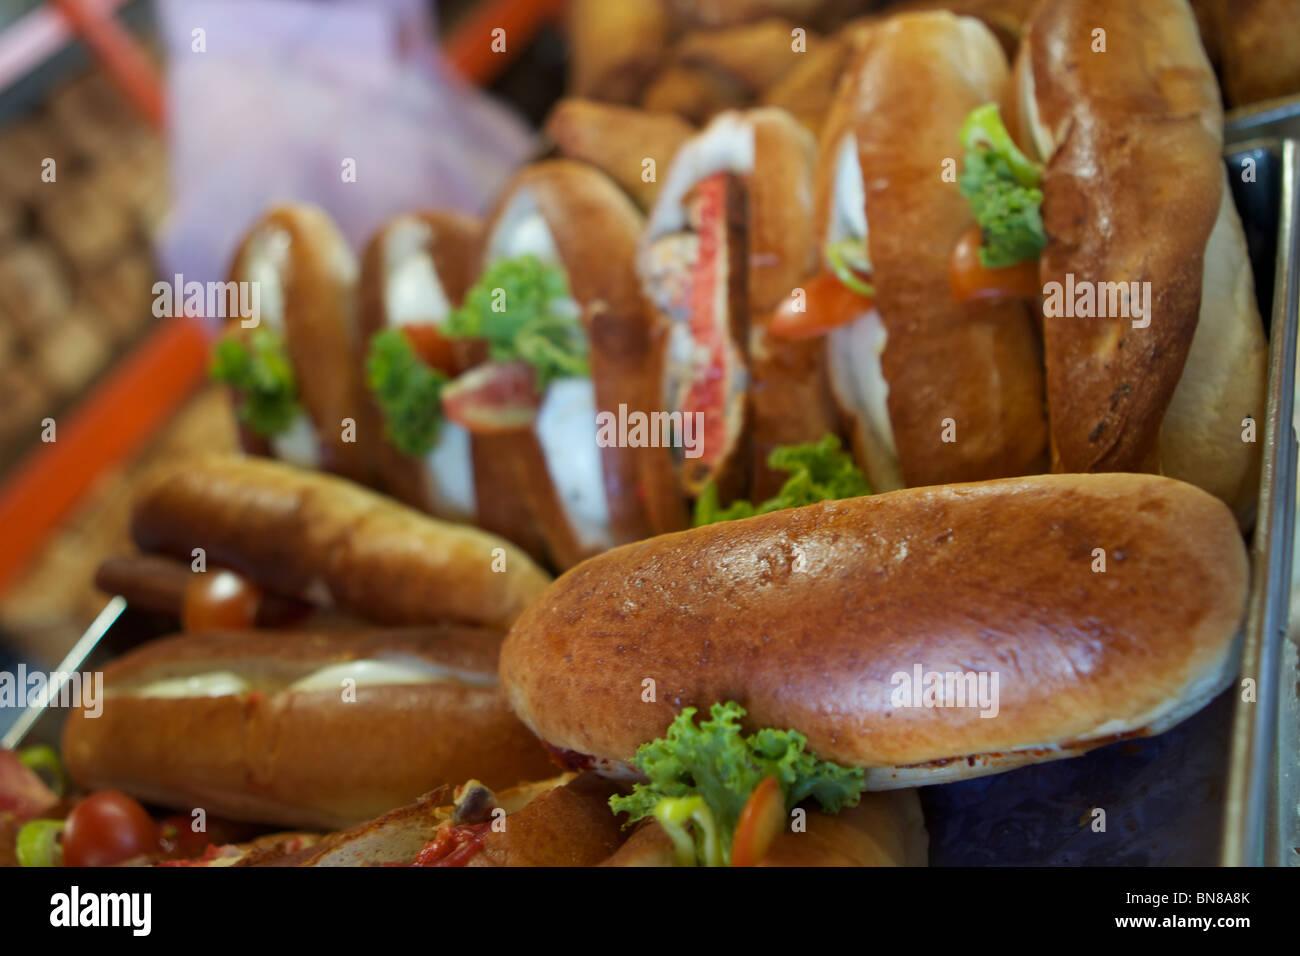 sandwiches from sri lanka - Stock Image